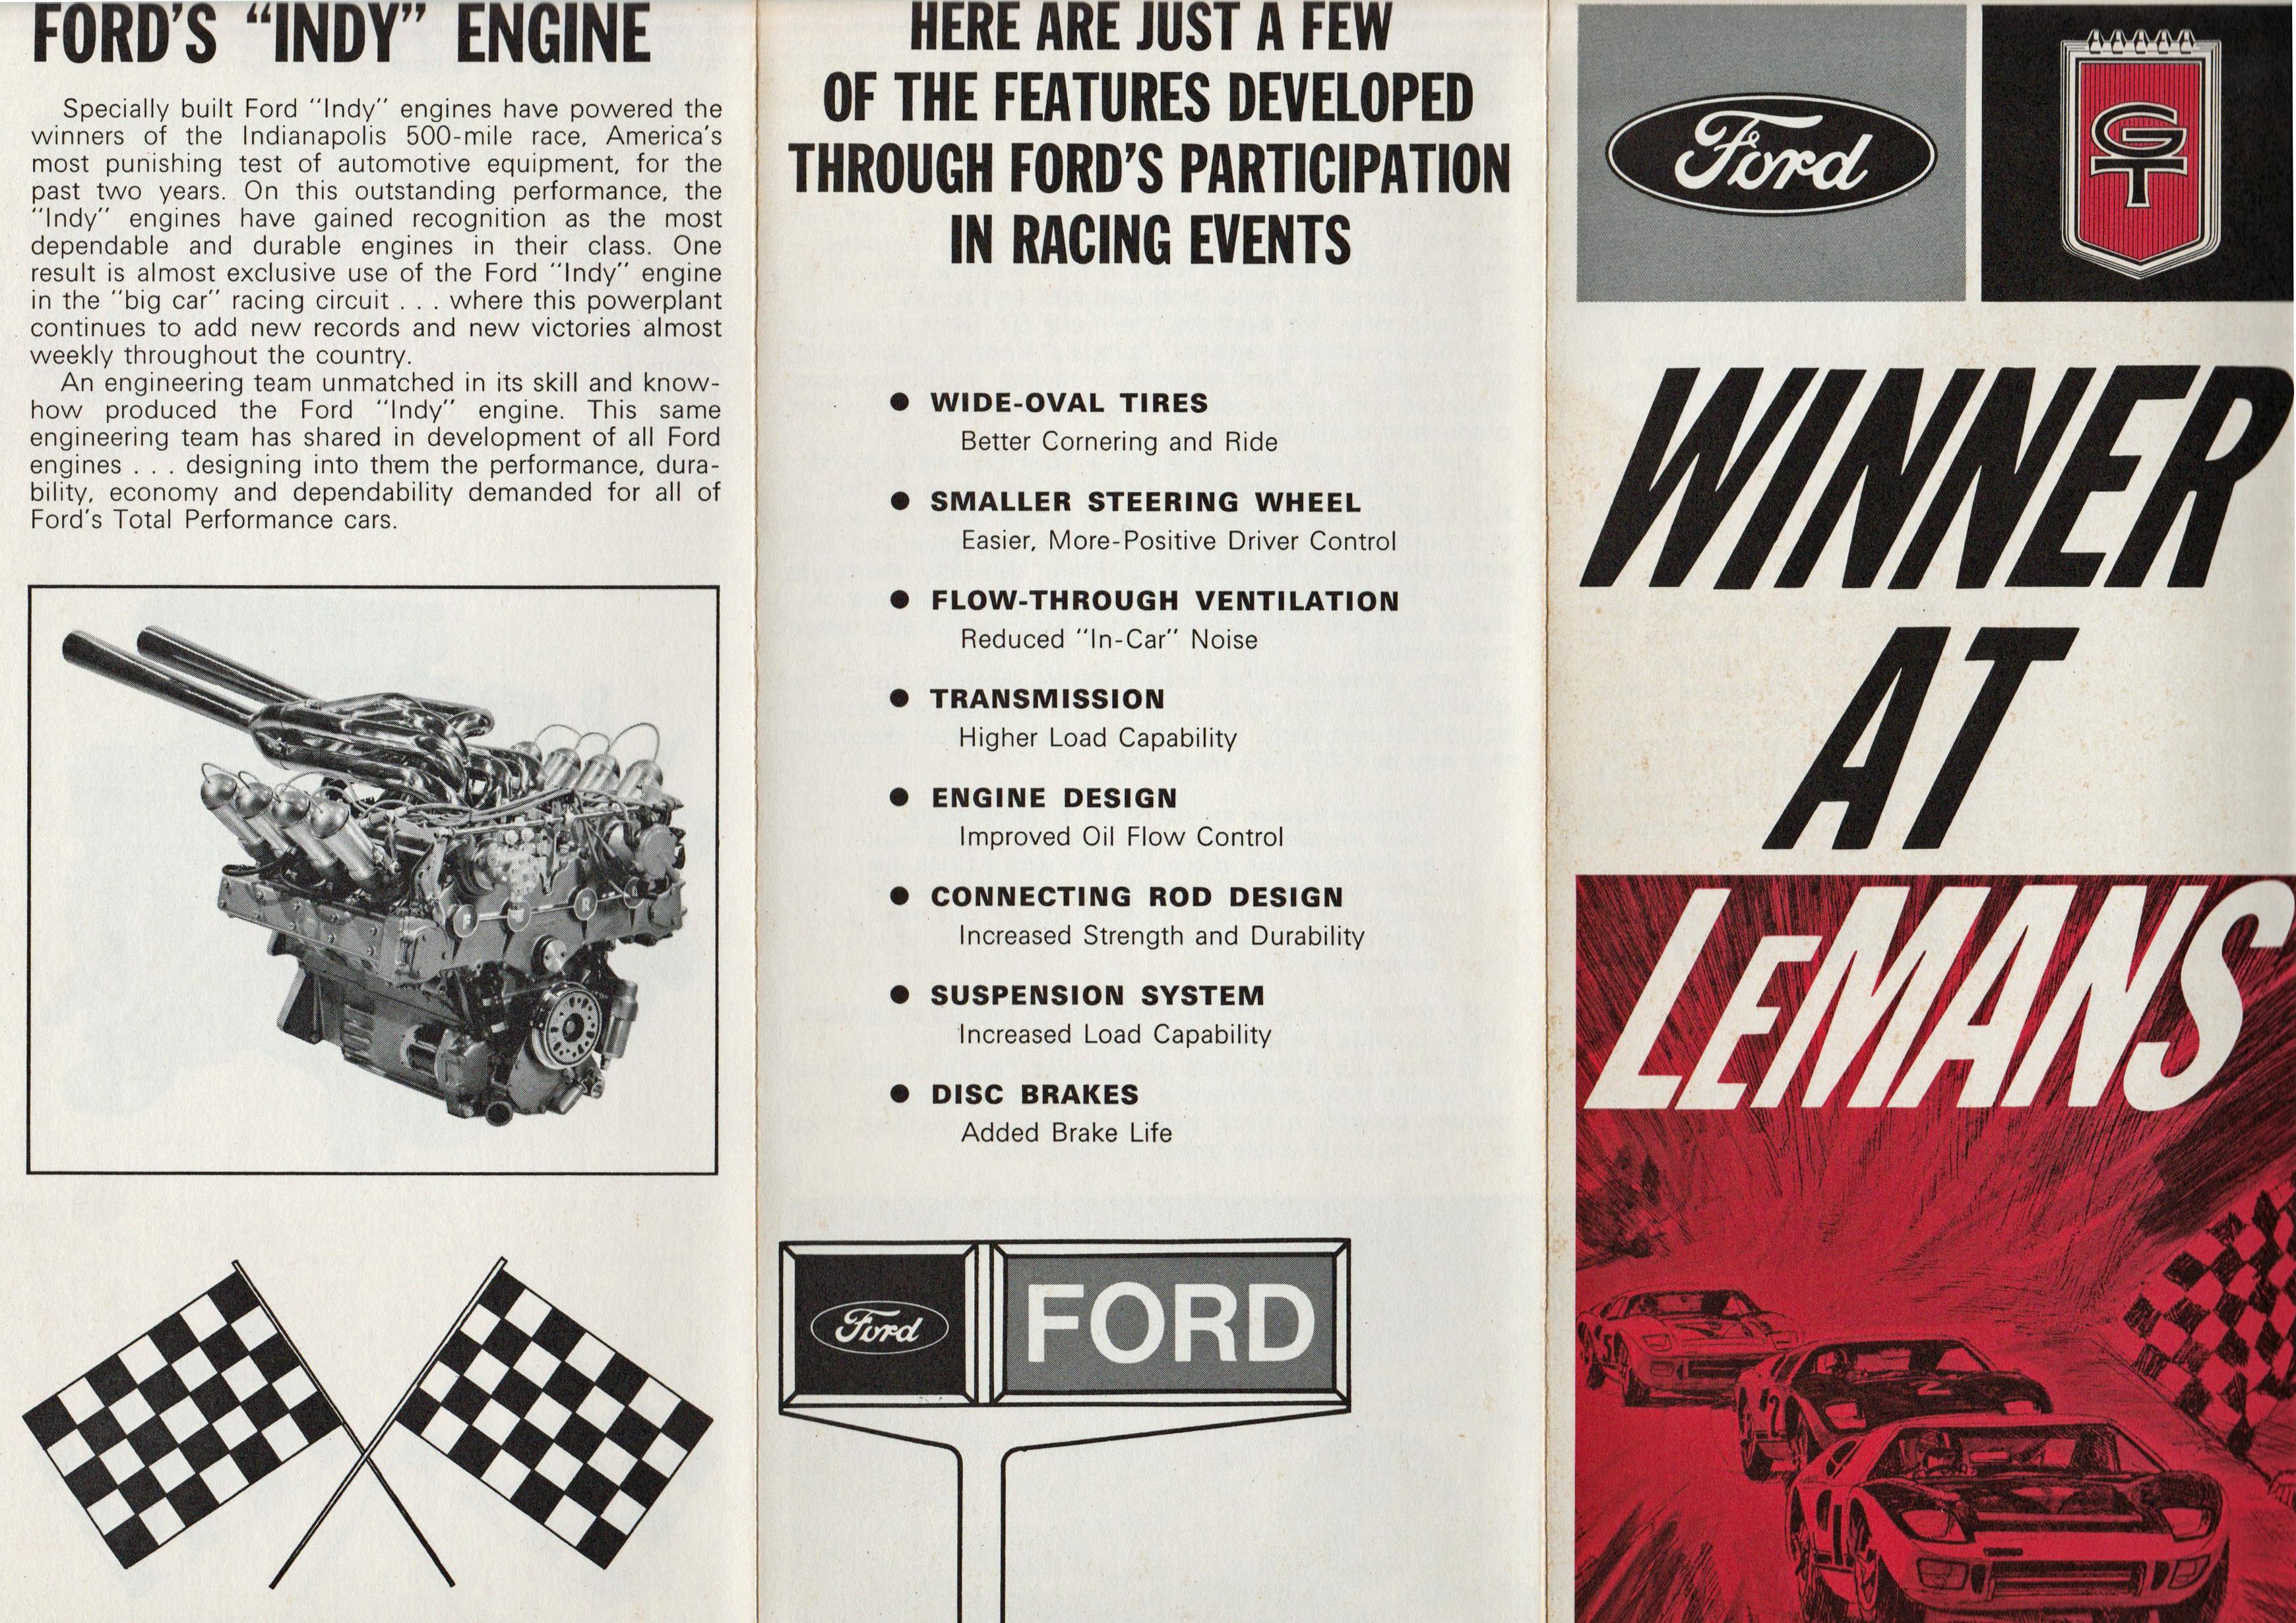 1966 Ford GT40 Le Mans Brochure